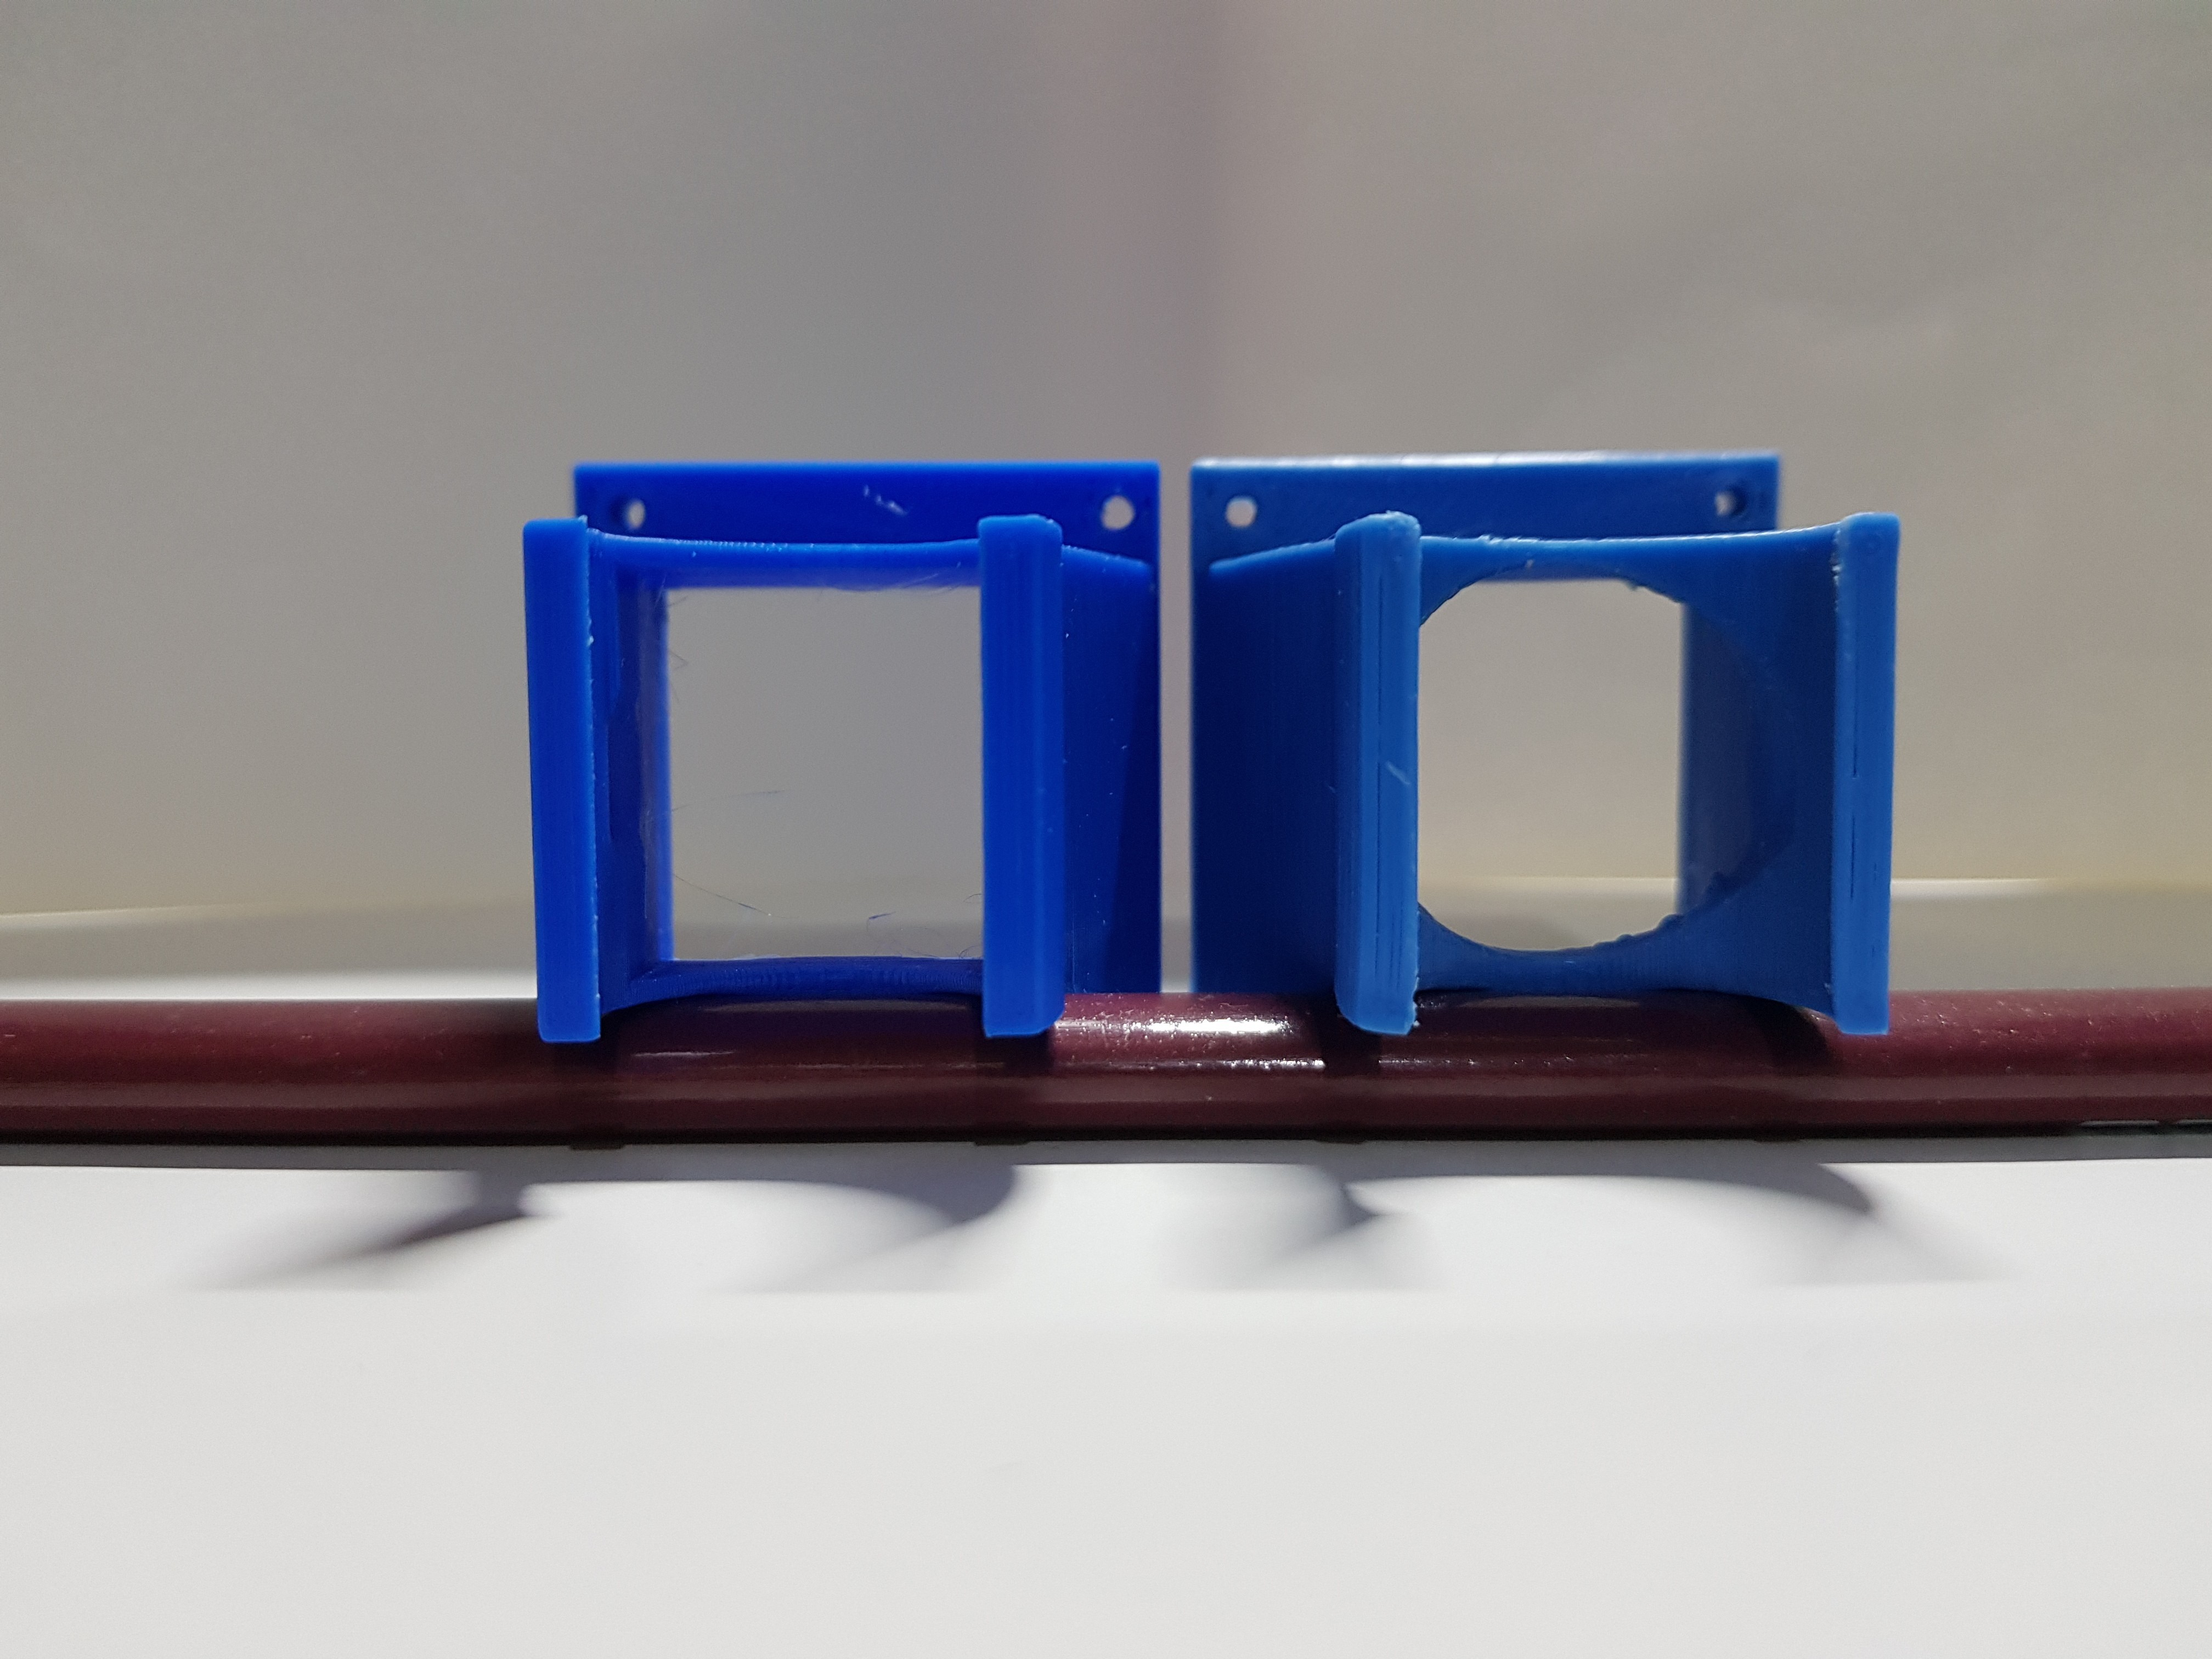 20180429_221703.jpg Download free STL file 40mm Fan Adaptor For Smart Effector • 3D printable object, gaza07